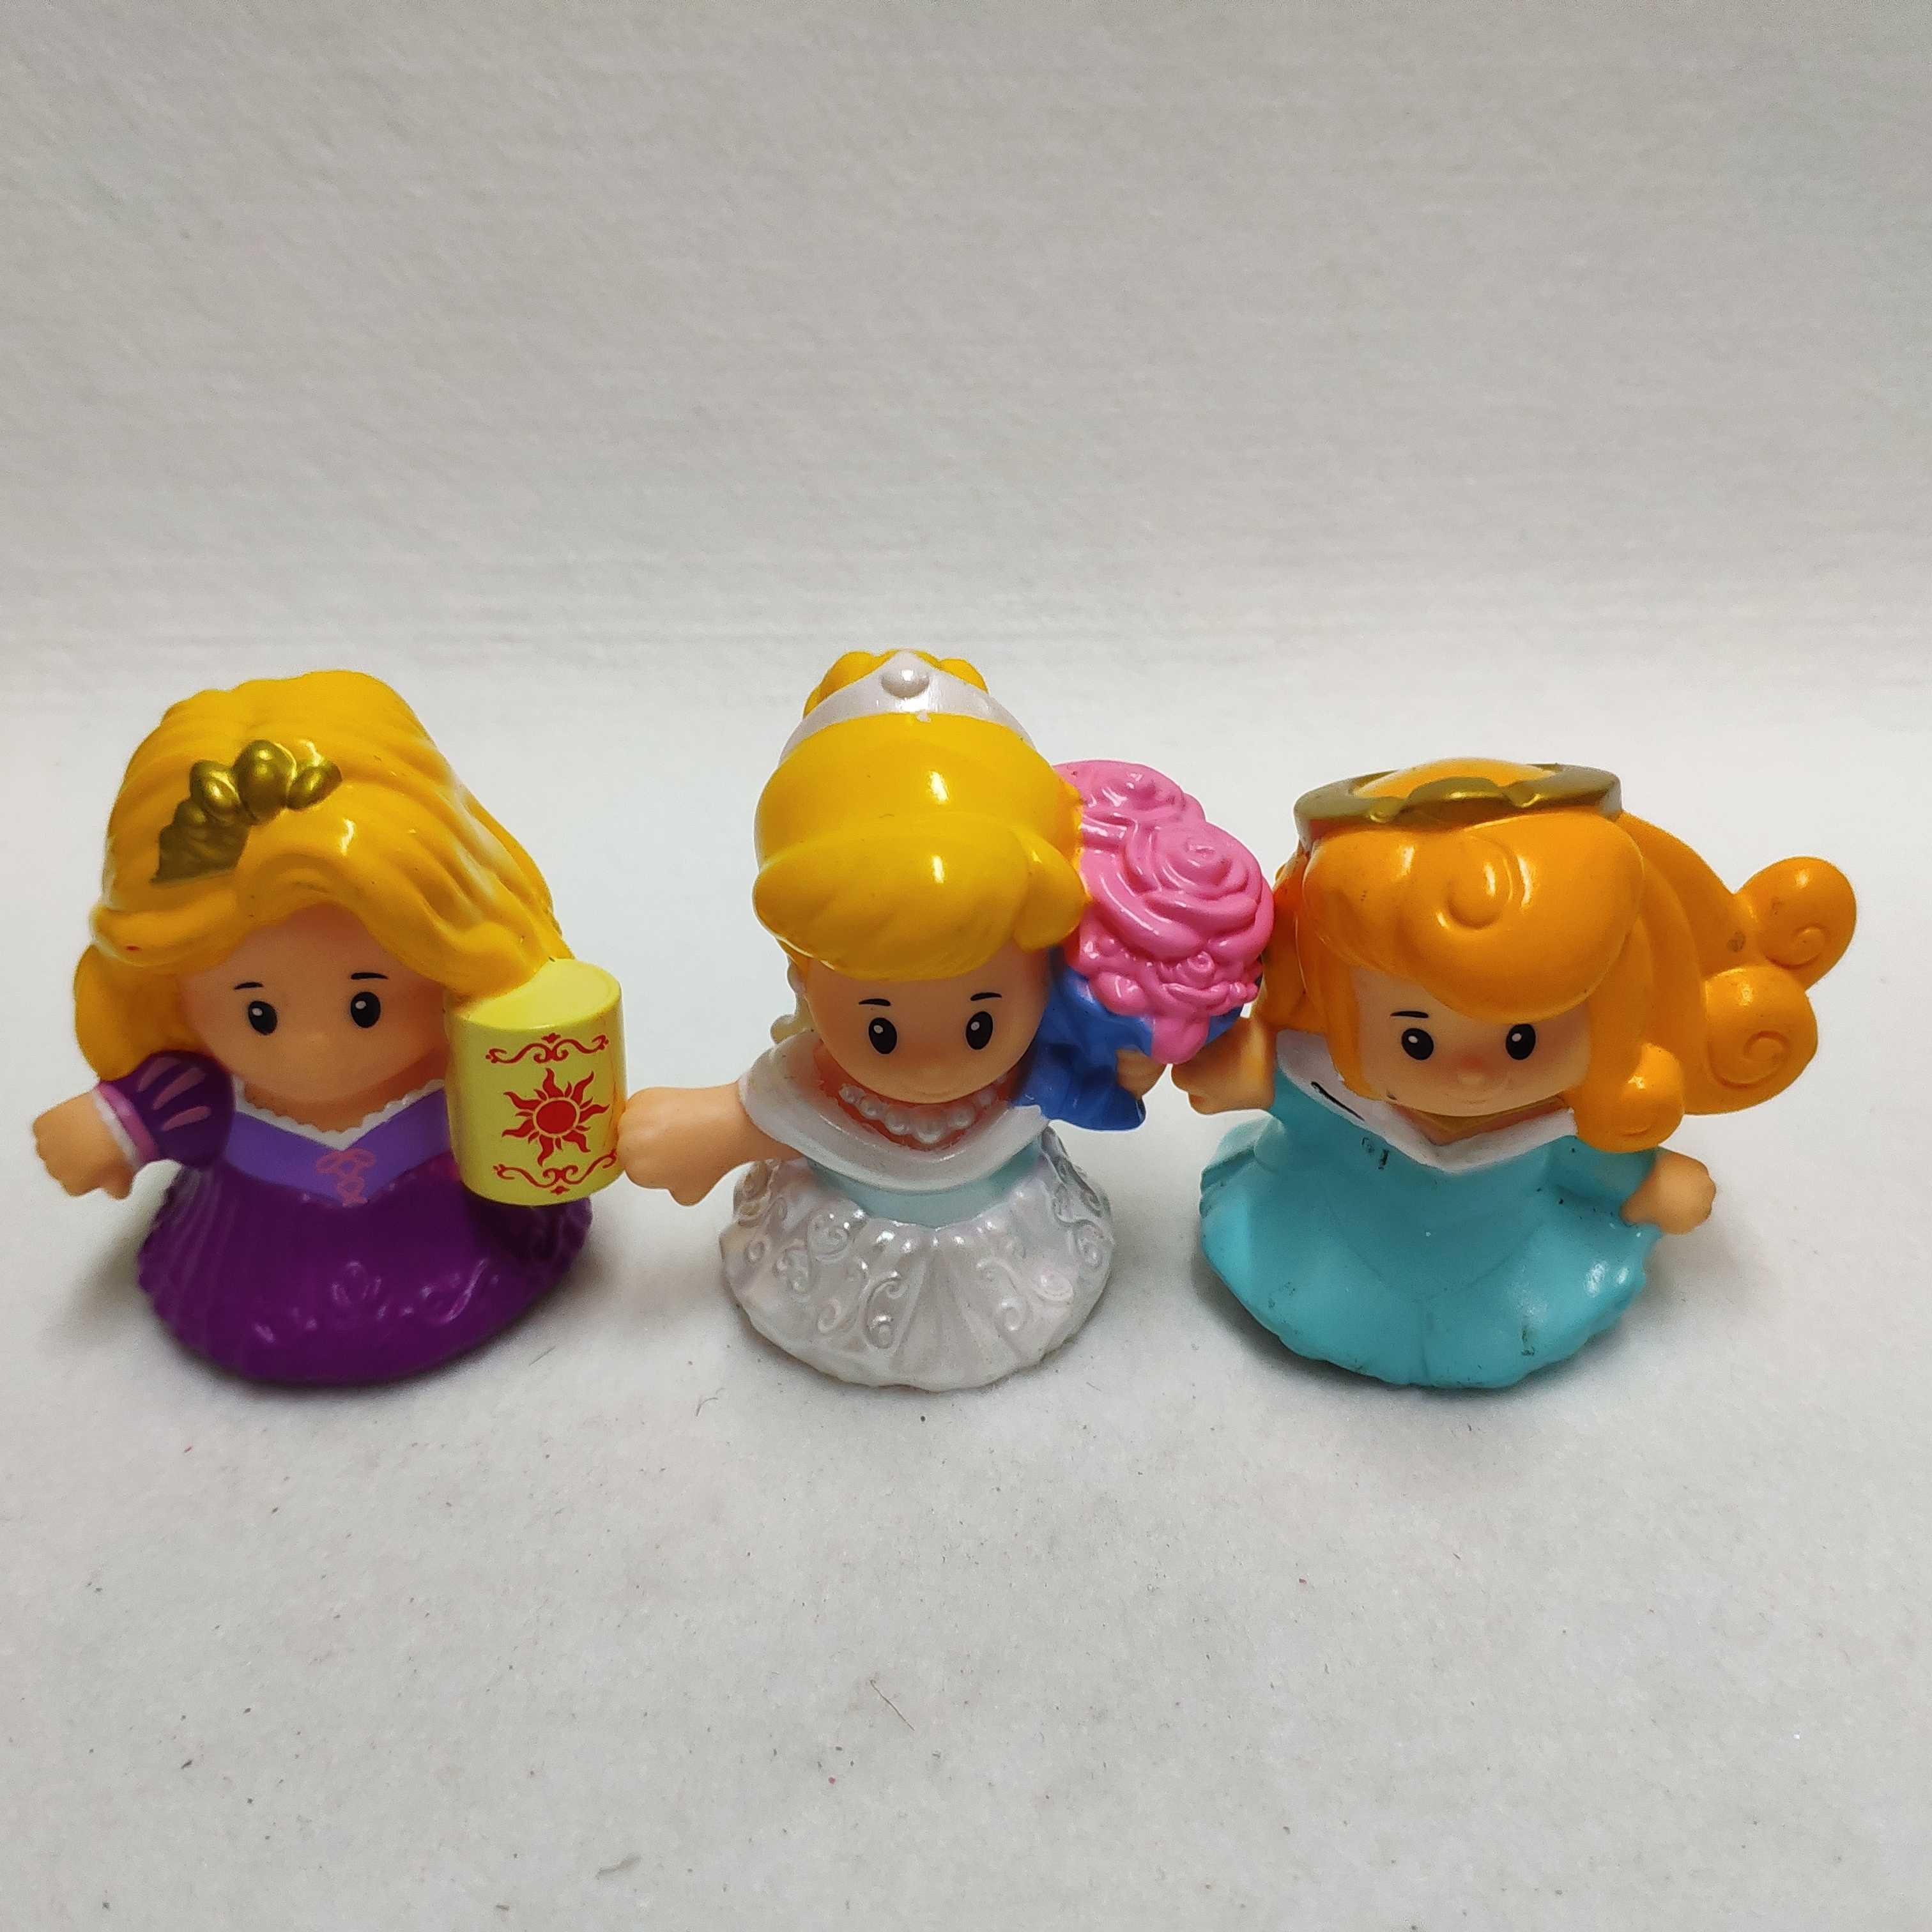 2pcs Fisher Price Little People Disney Princess Cinderella /& Rapunzel Figure Toy